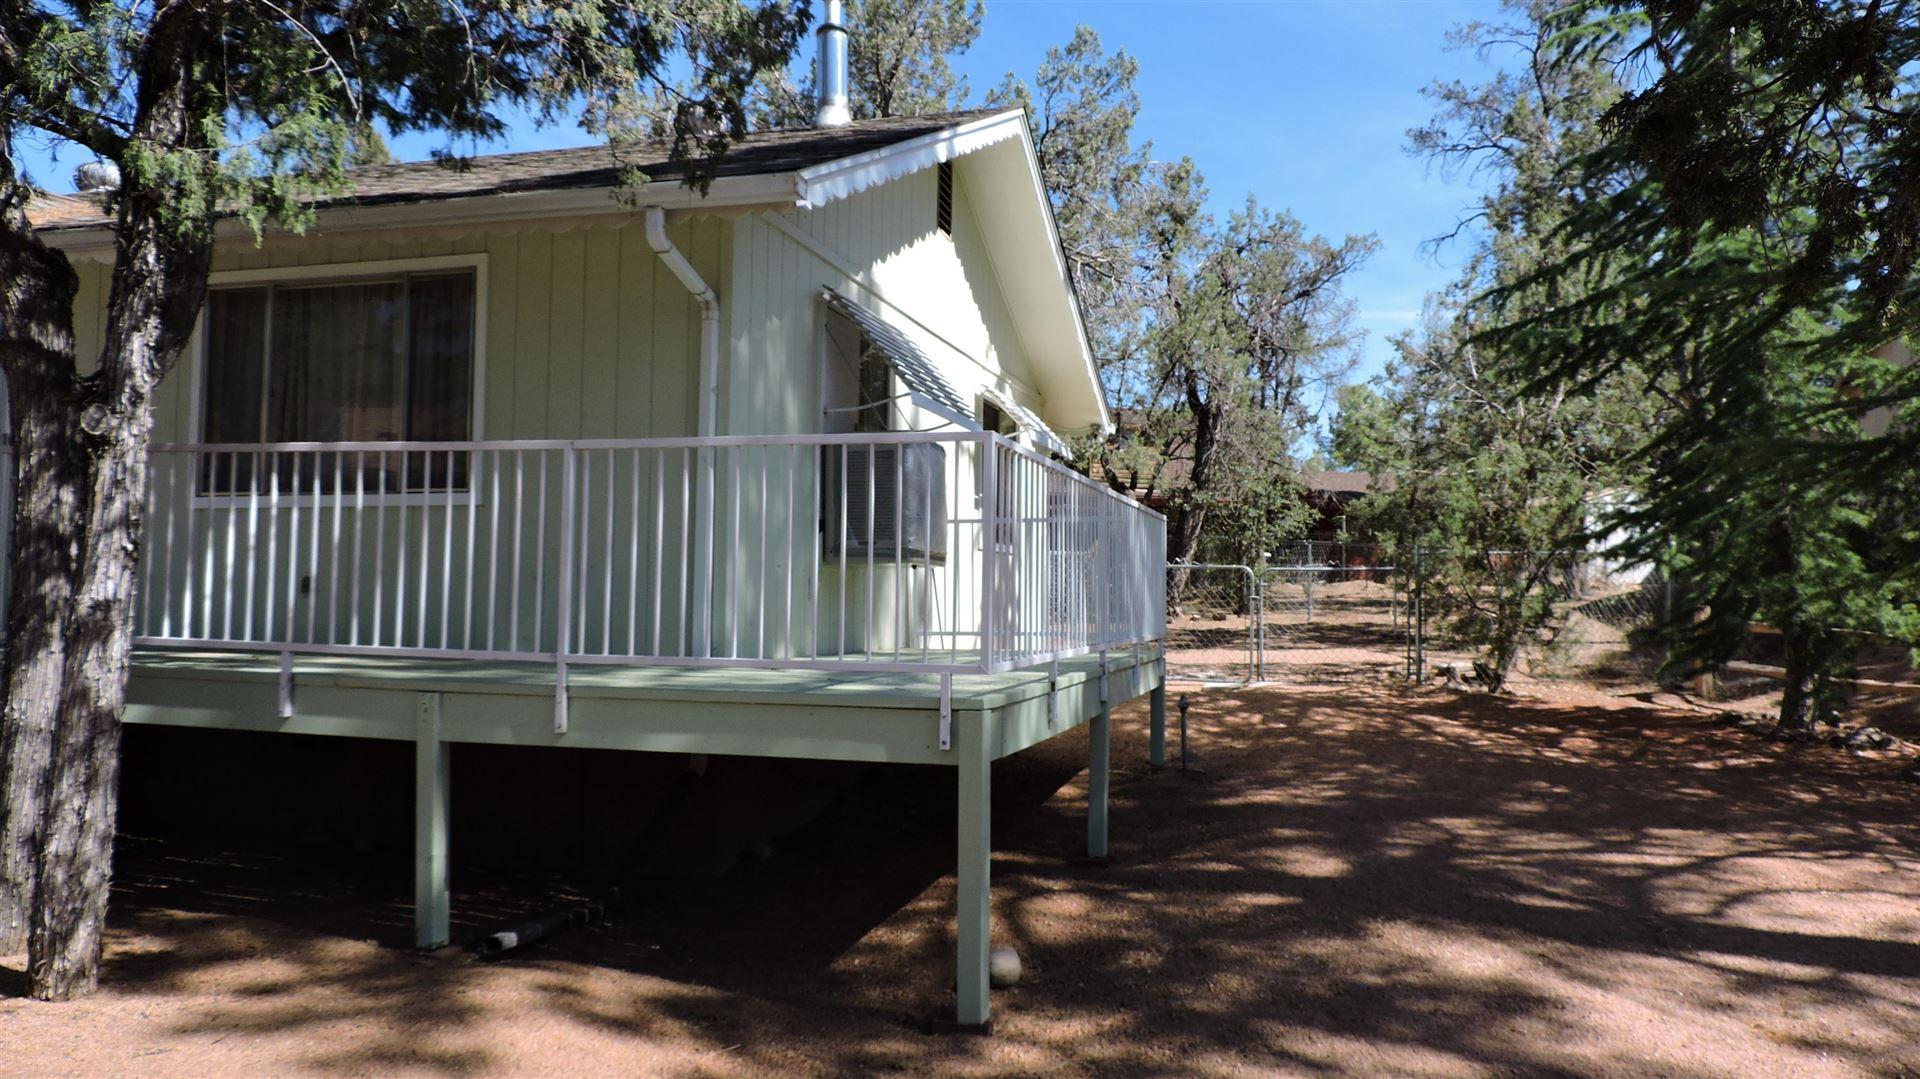 Photo of 306 E Timber Circle #21, Payson, AZ 85541 (MLS # 82825)